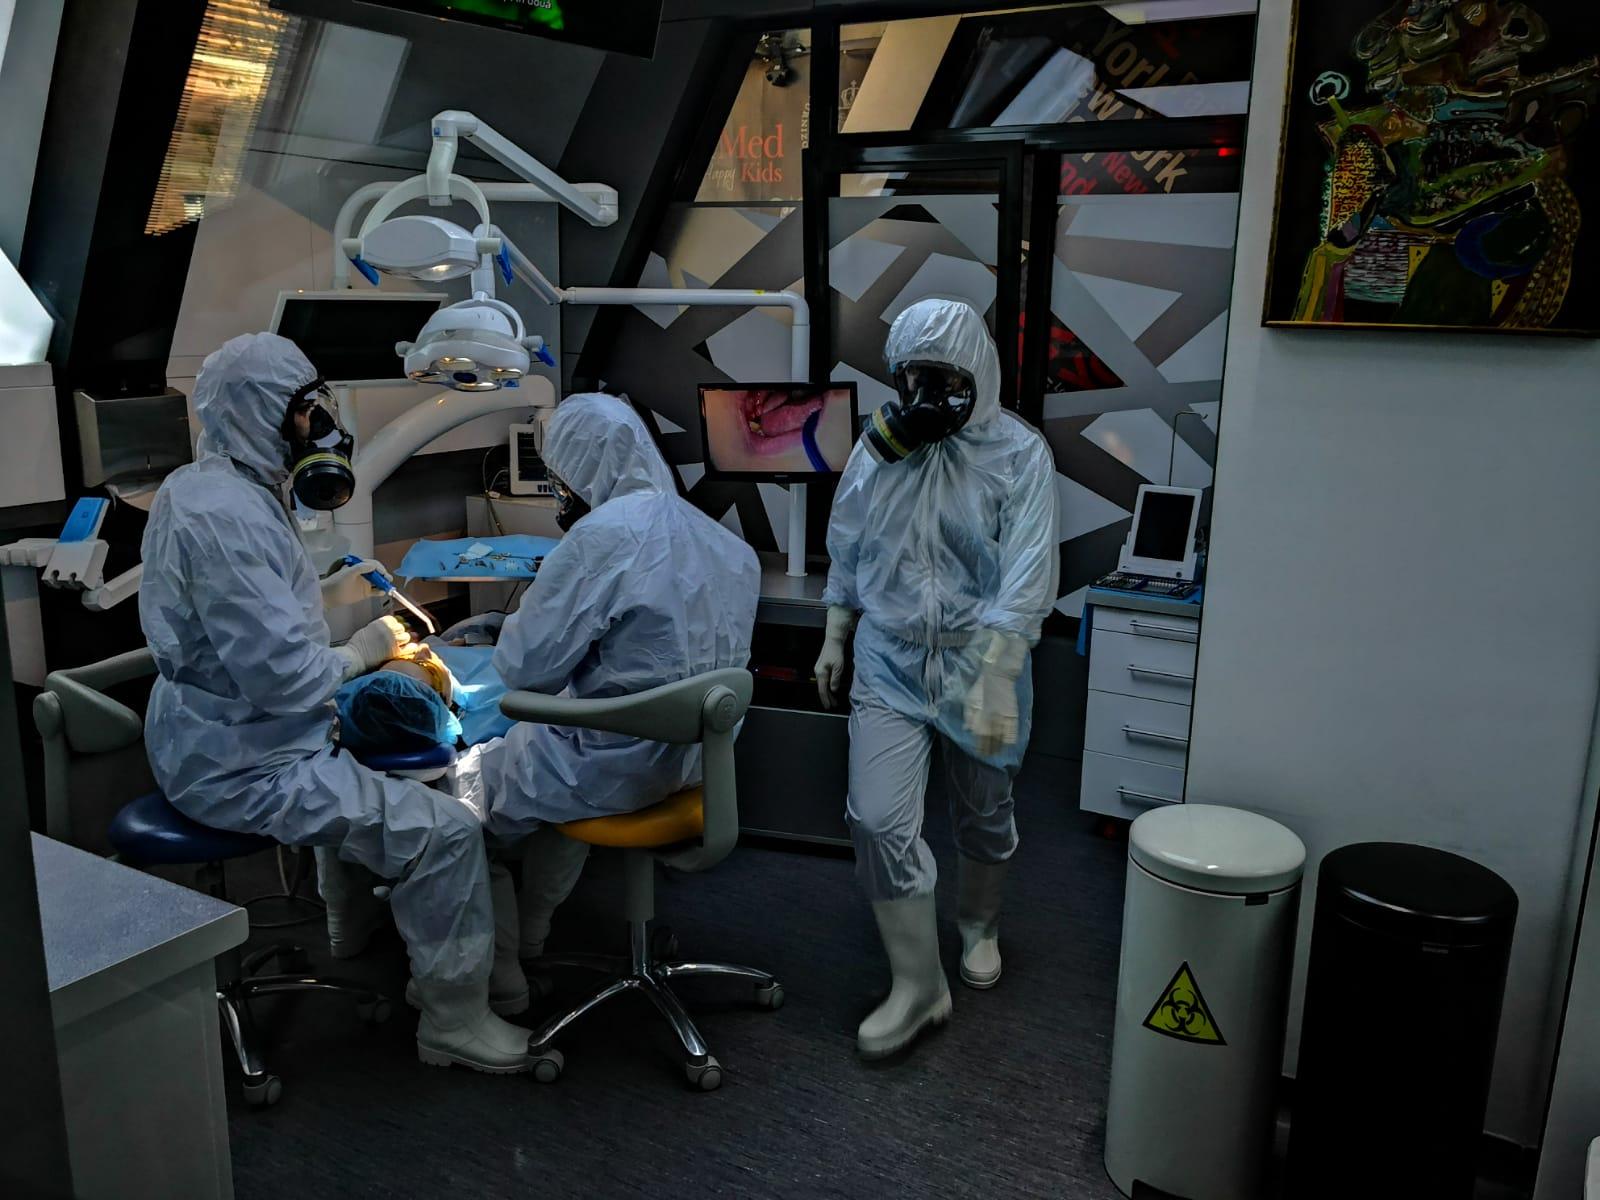 WhatsApp Image 2020 04 23 at 10.25.11 1 Urgente stomatologice in Starea de Urgenta nationala